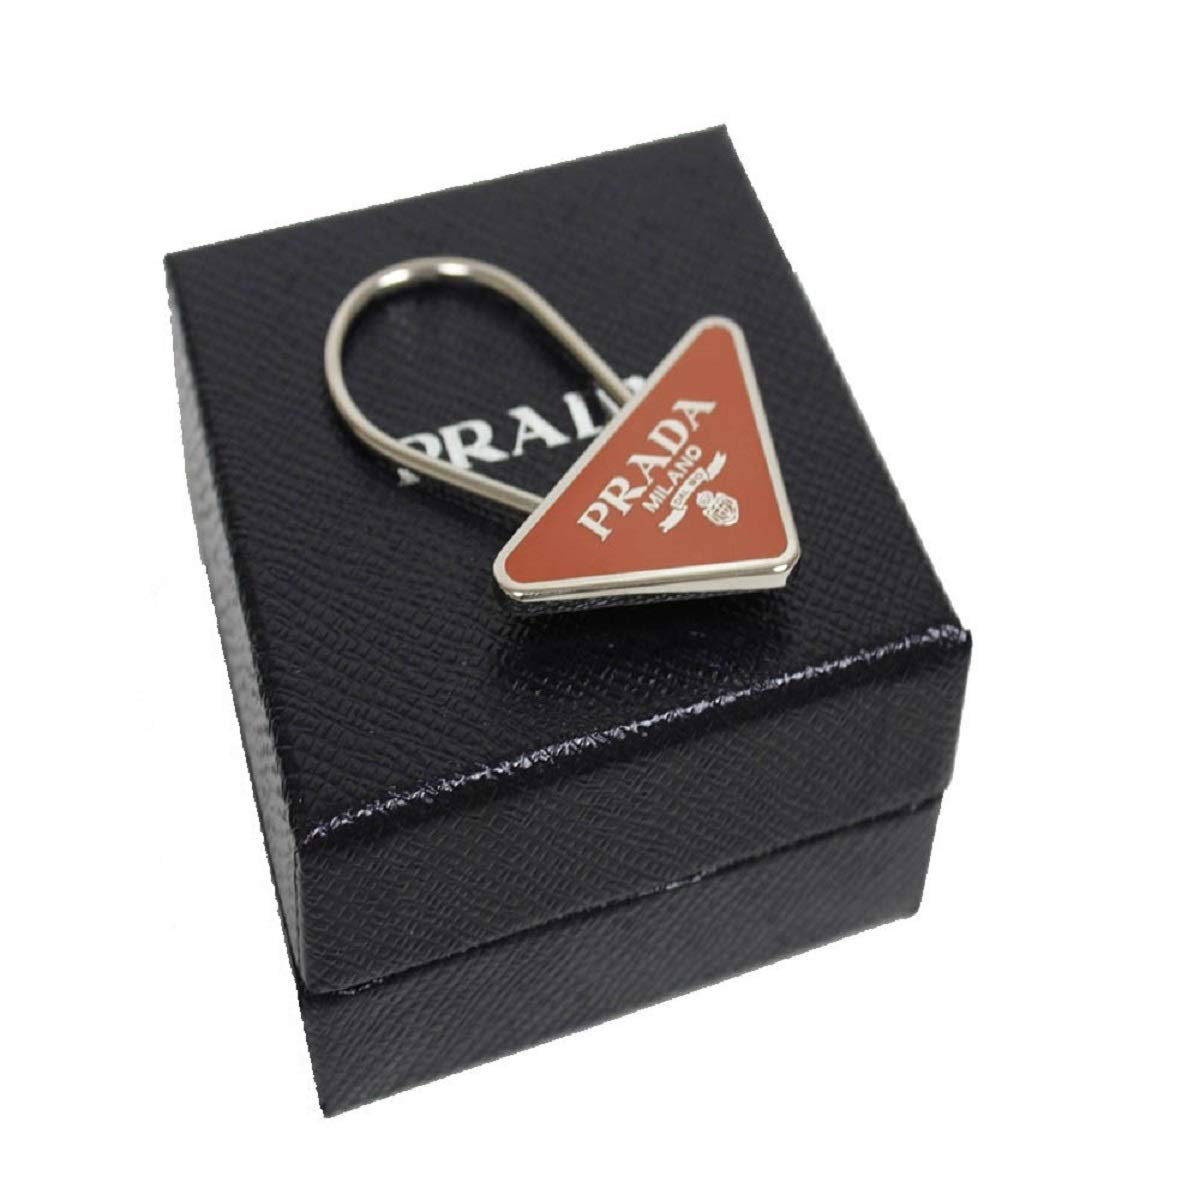 Prada Portachiavi Smalto Papaya Enameled Metal Triangle Logo Keychain 2PS395